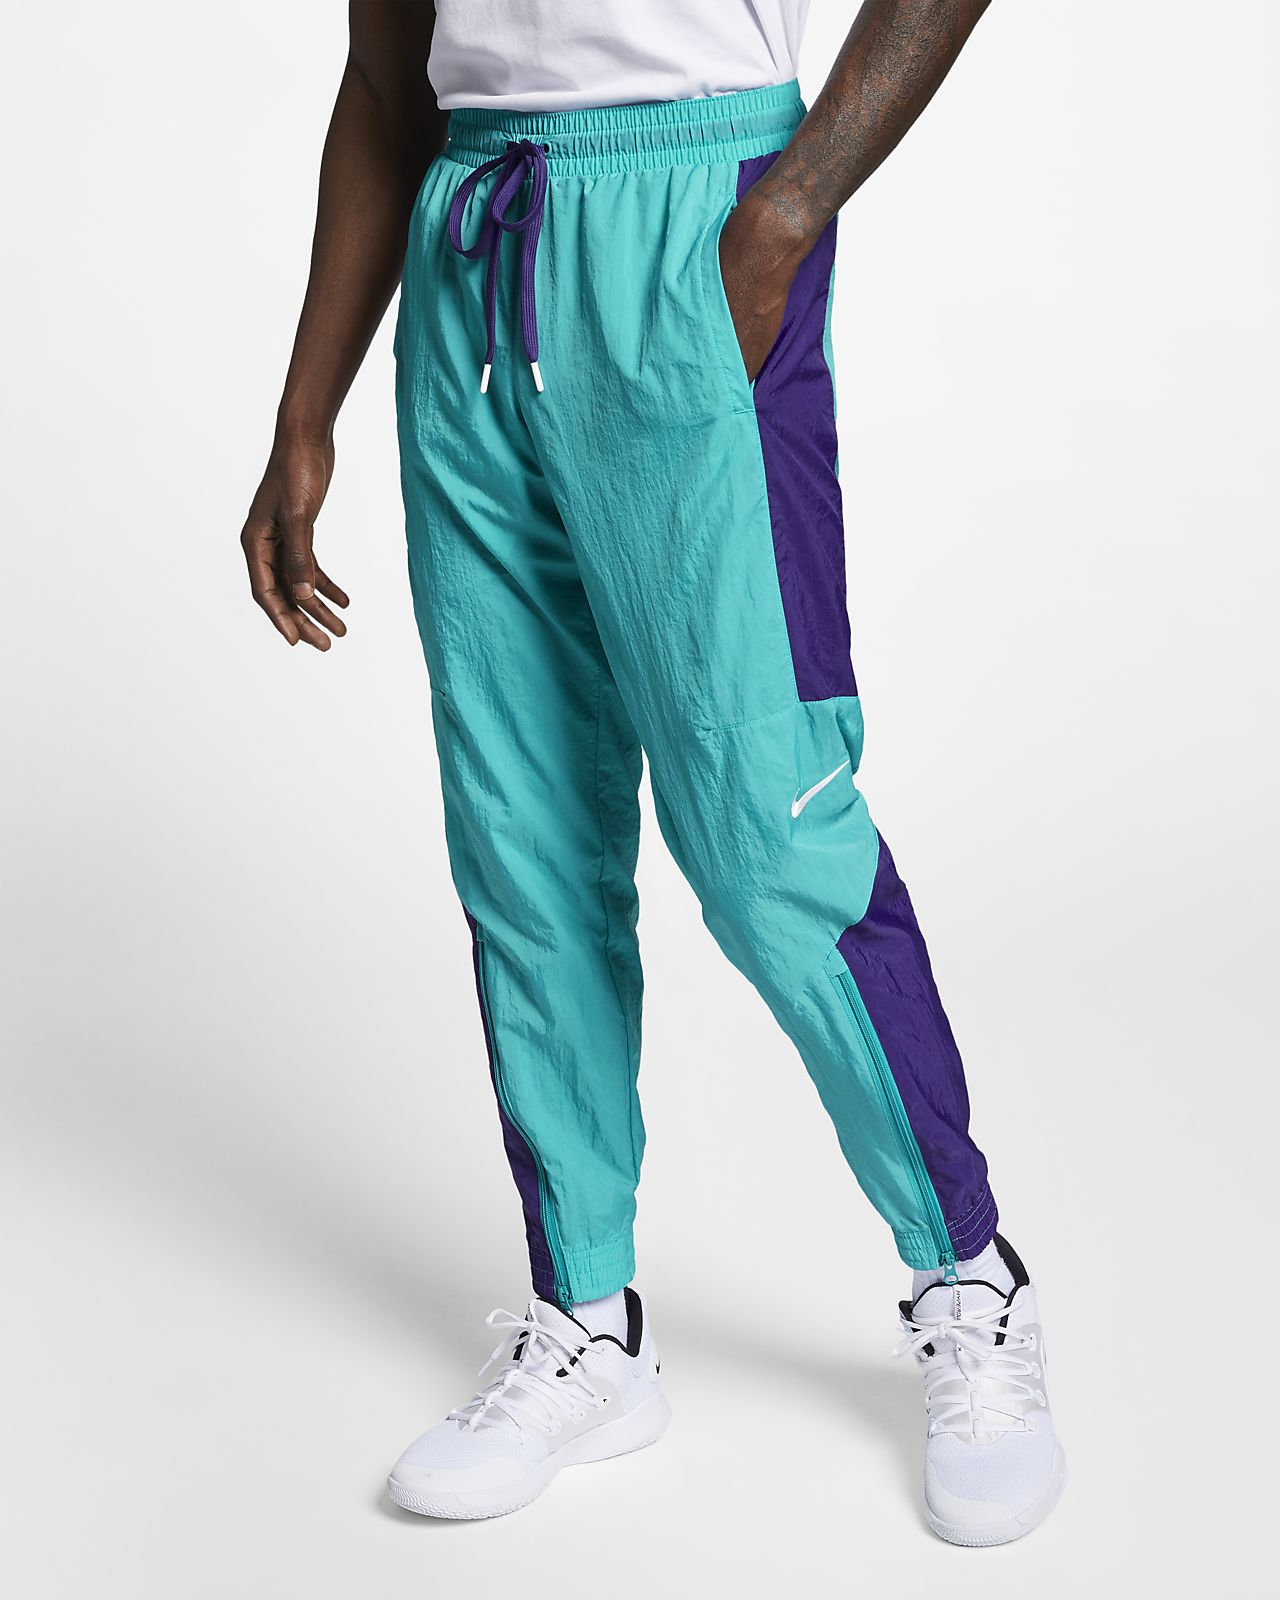 Nike Basketball Trousers